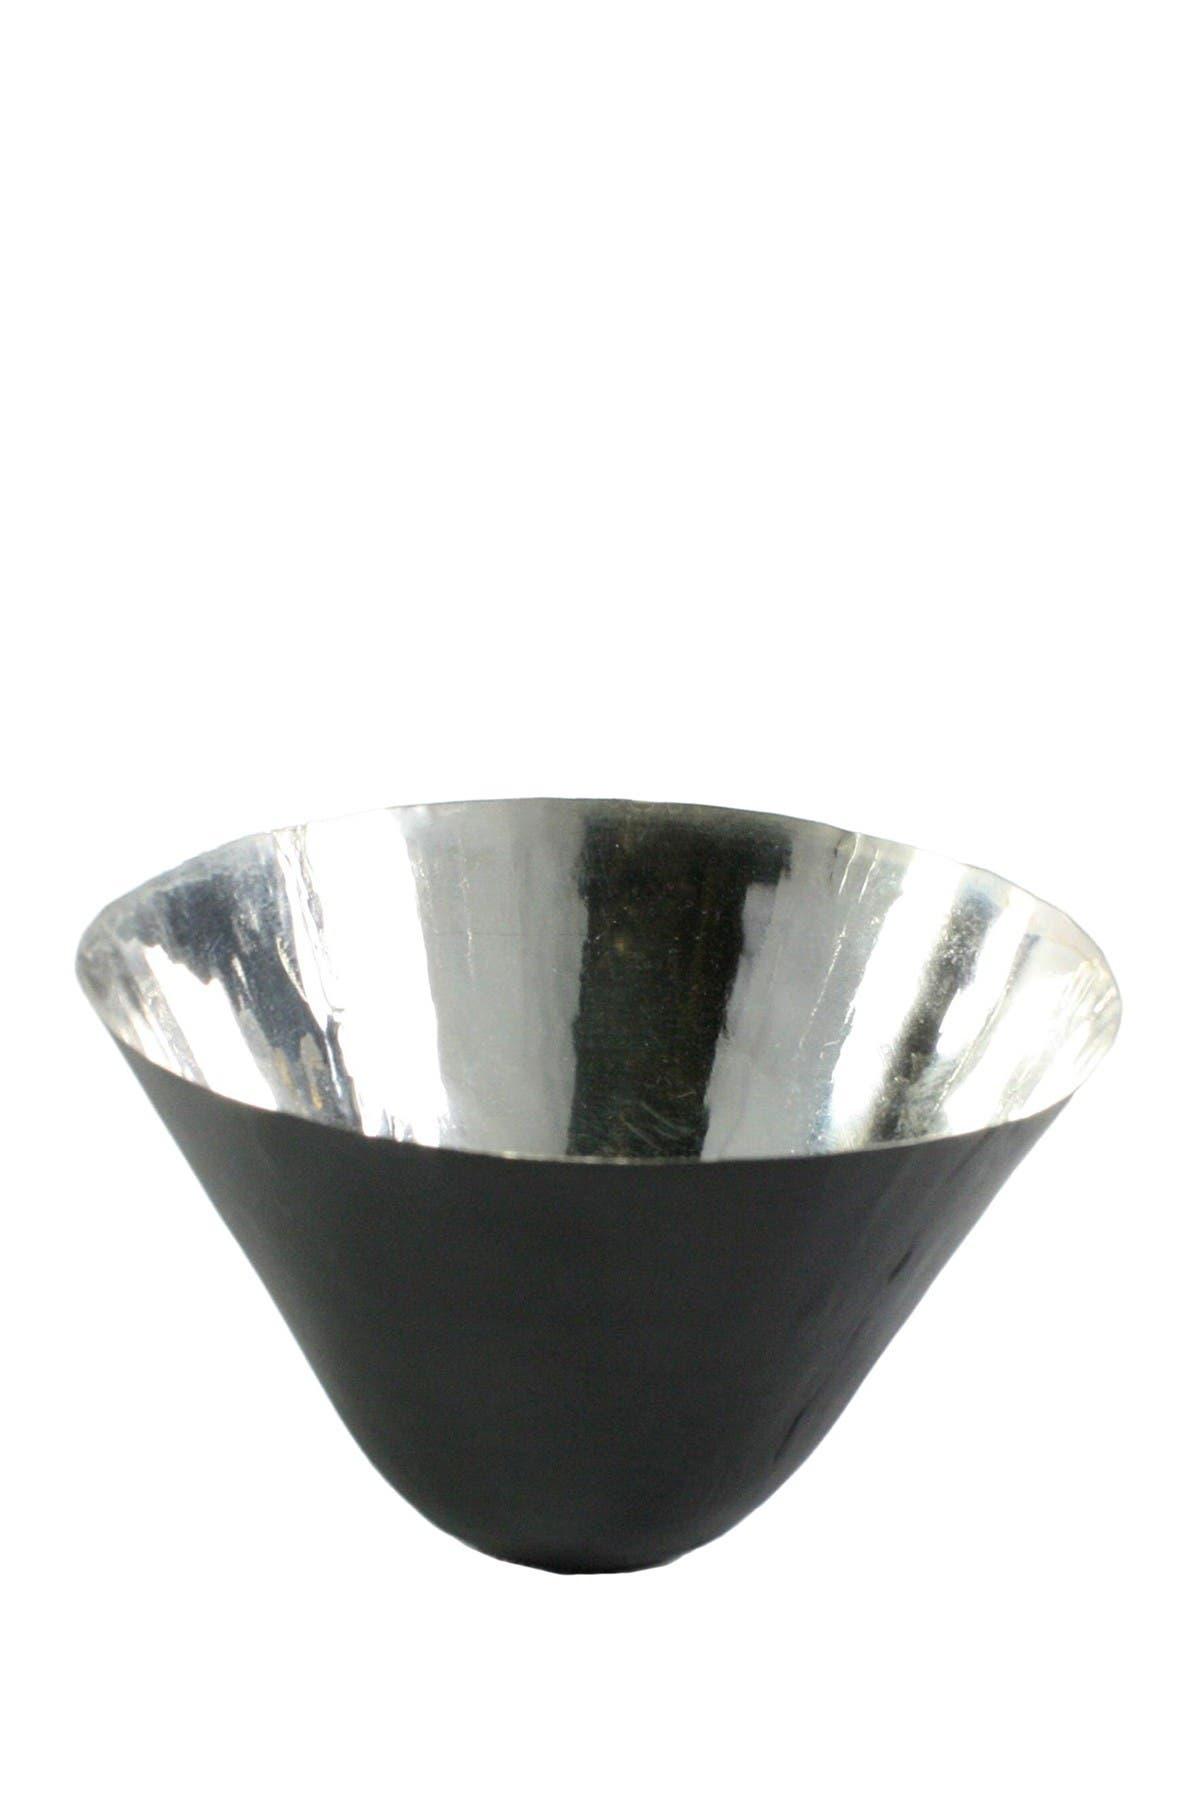 Image of HOMART Metal Black/Silver Conical Bowl